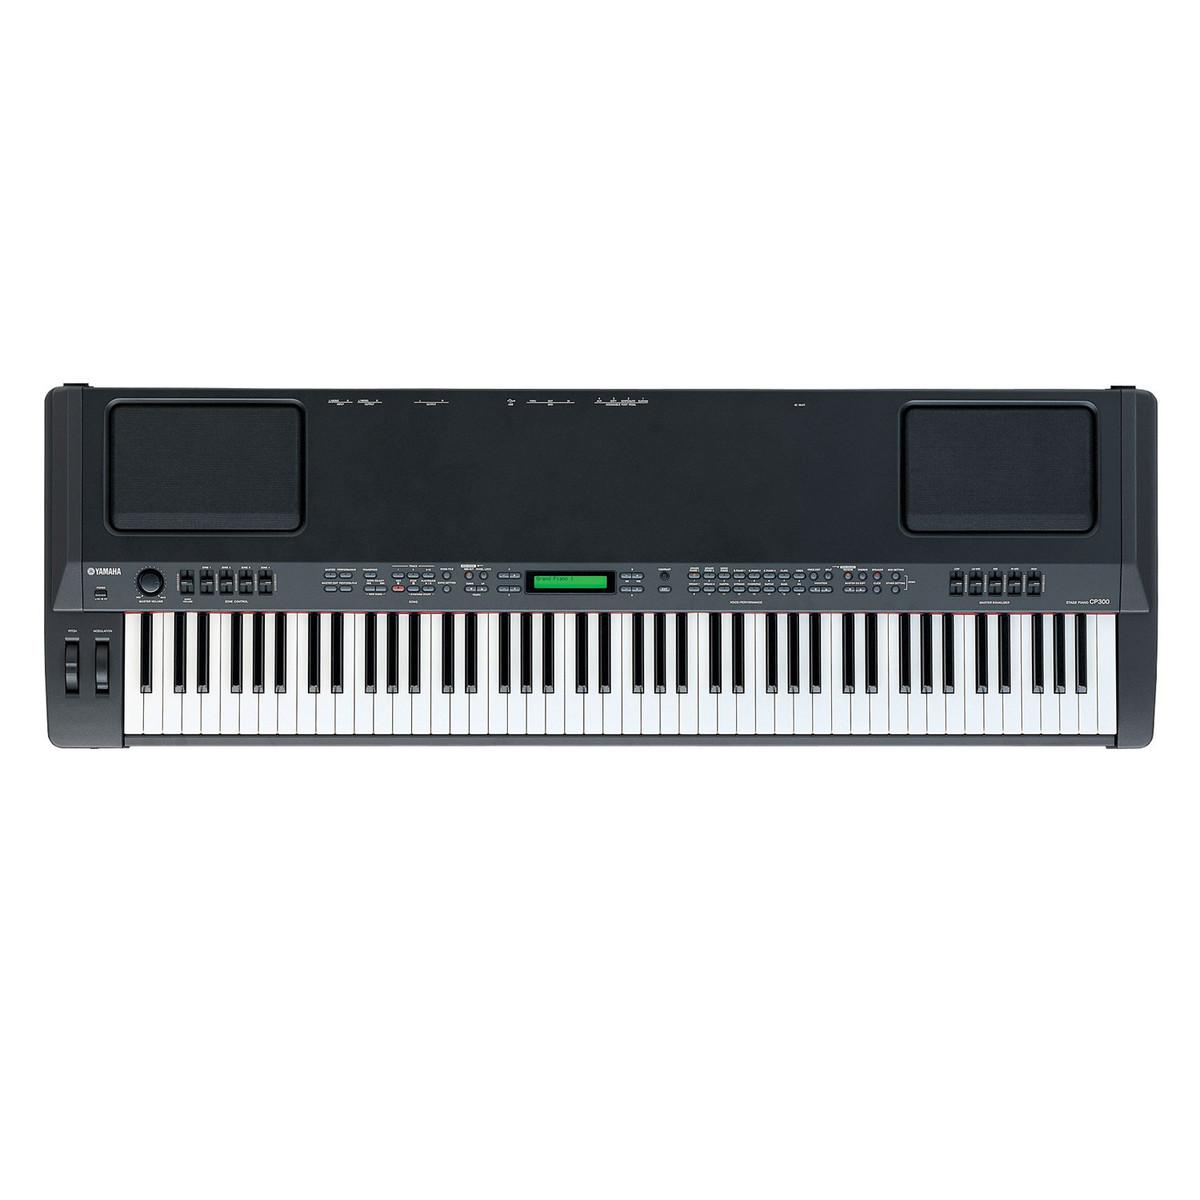 Image of Yamaha CP300 Digital Stage Piano